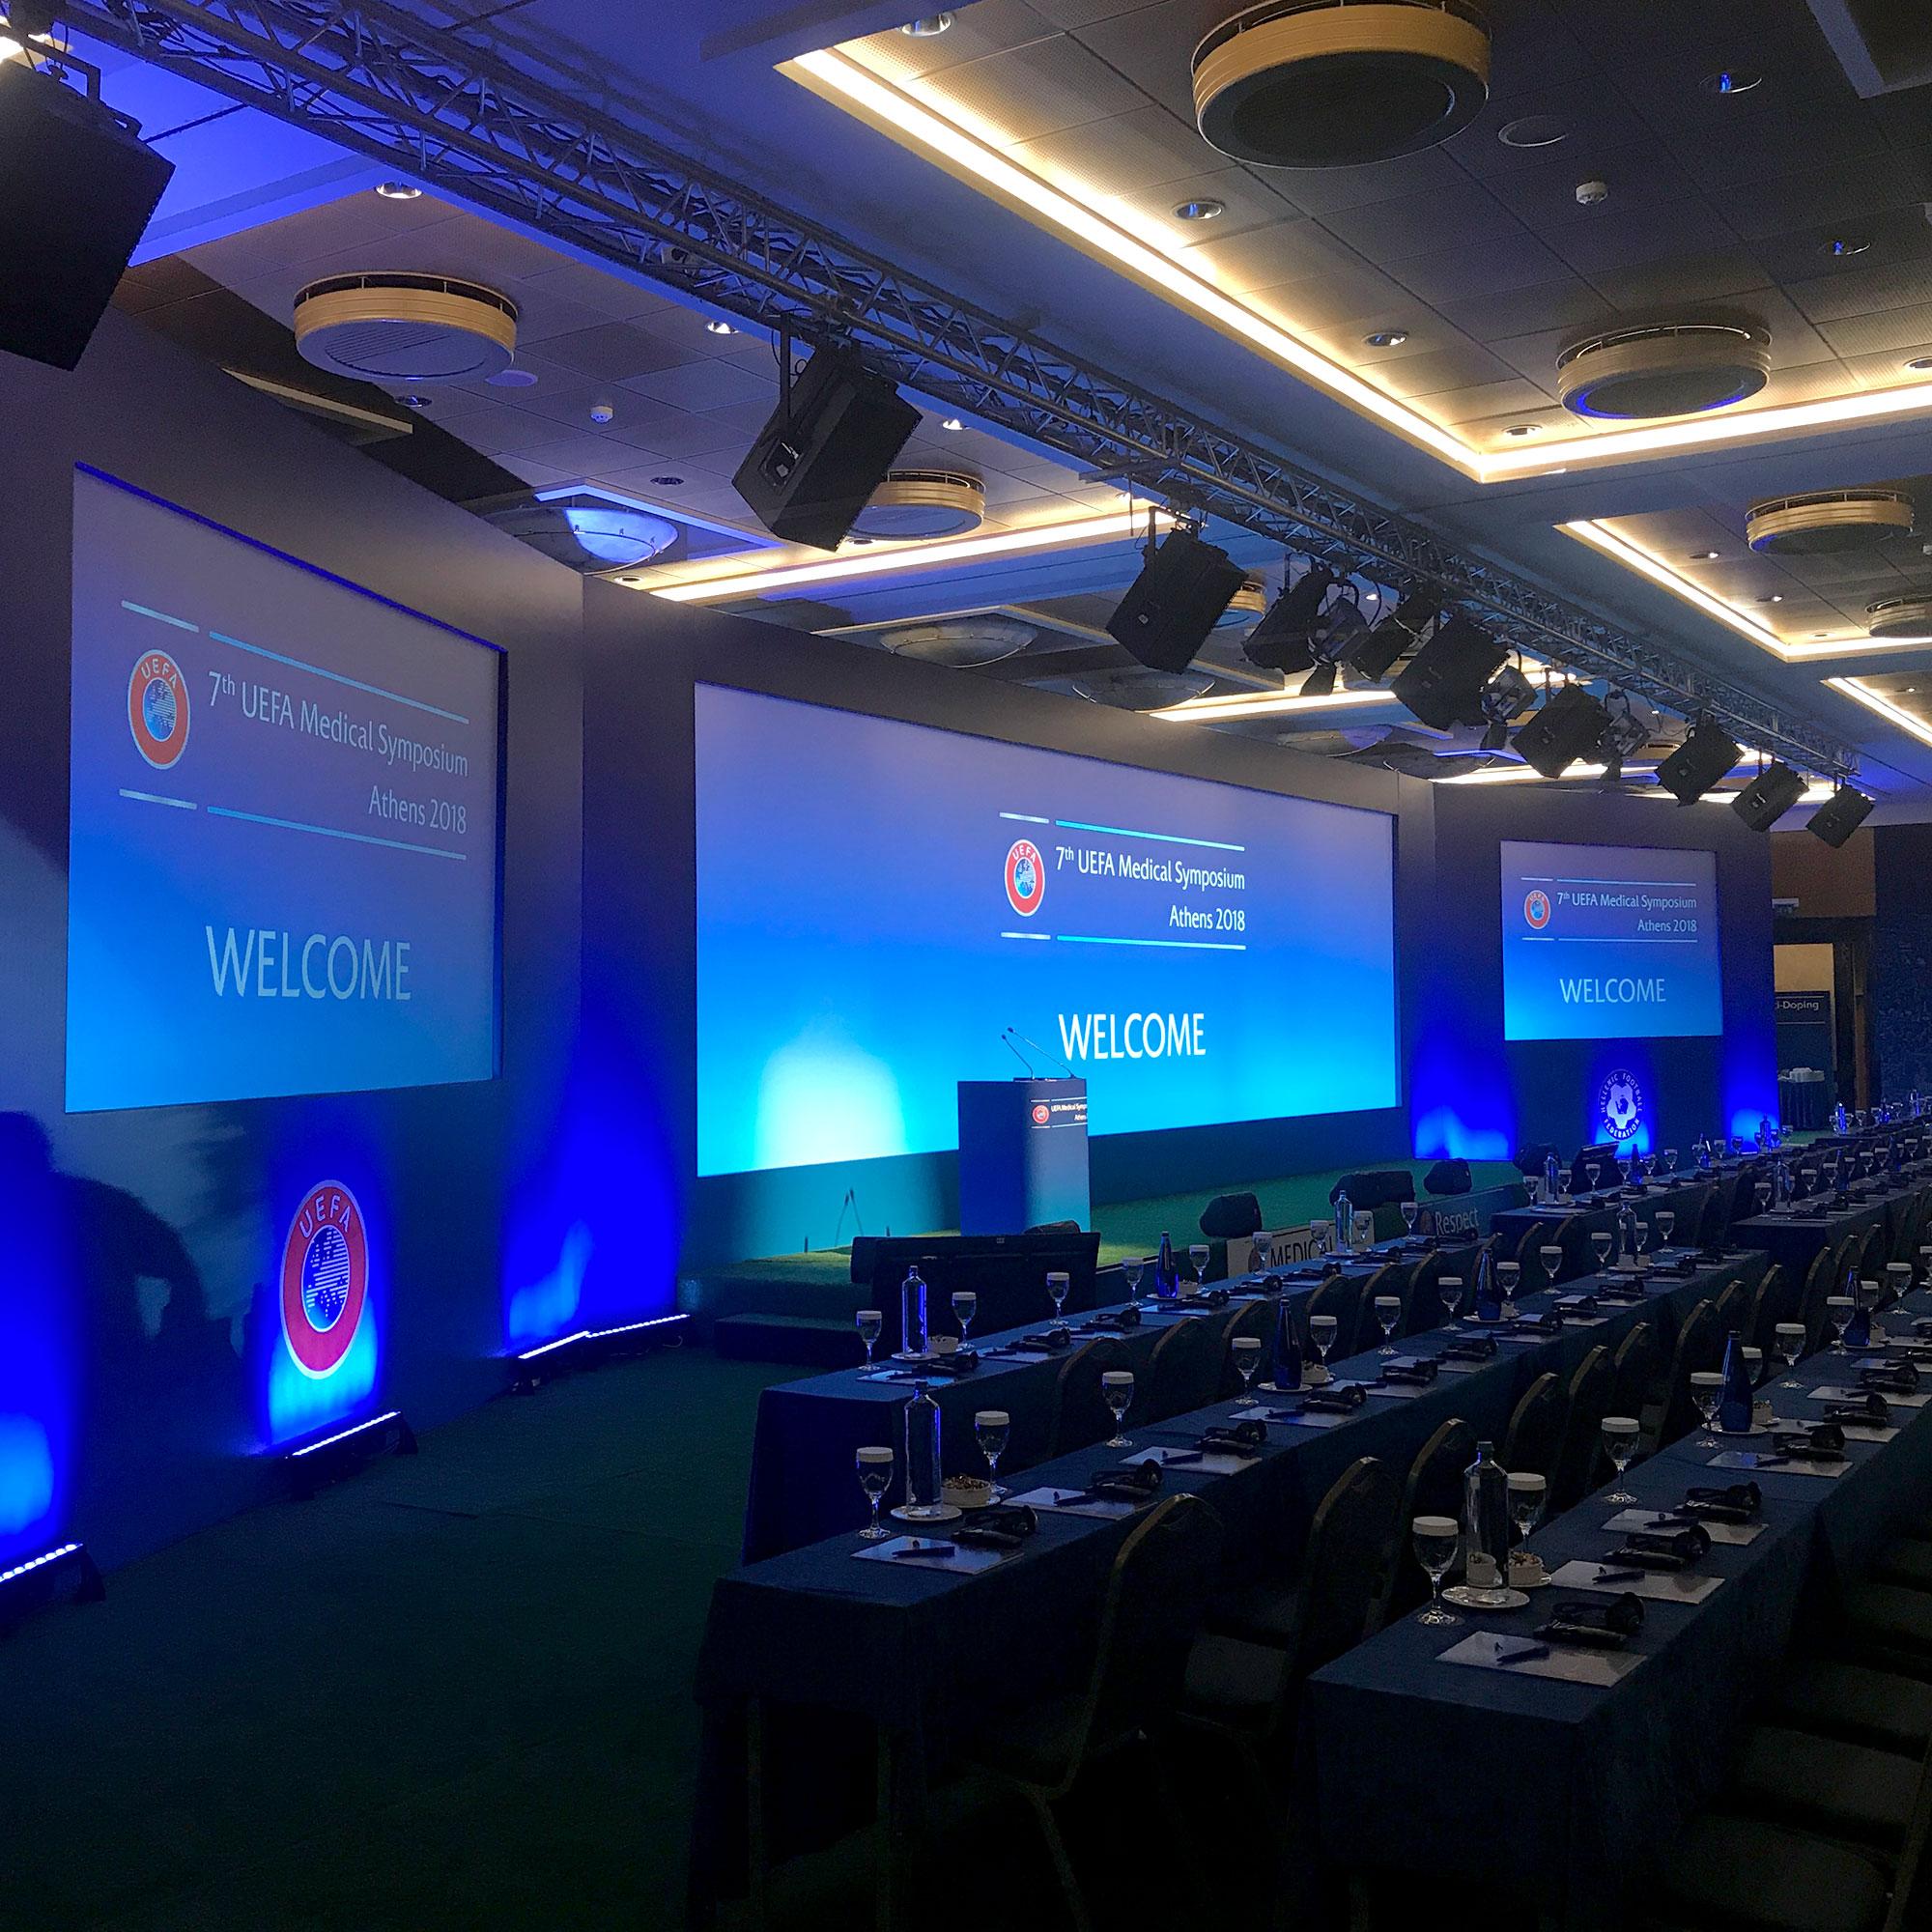 UEFA Medical Symposium